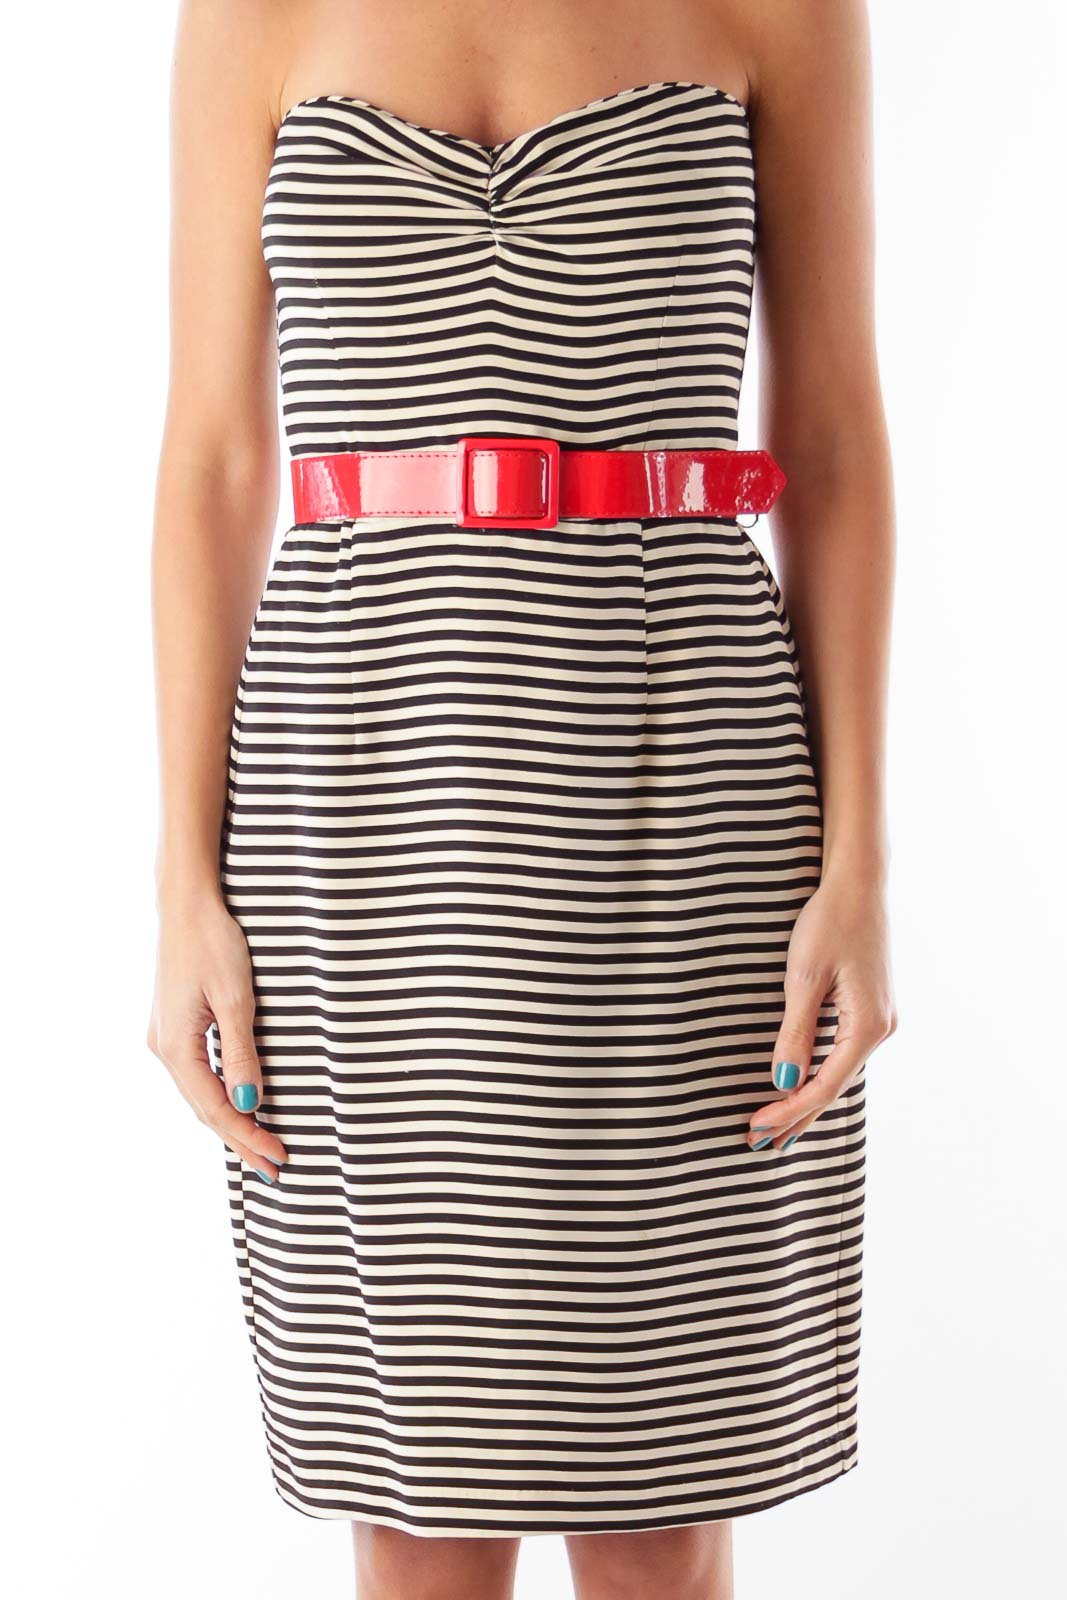 Black & White Stripe Dress Front